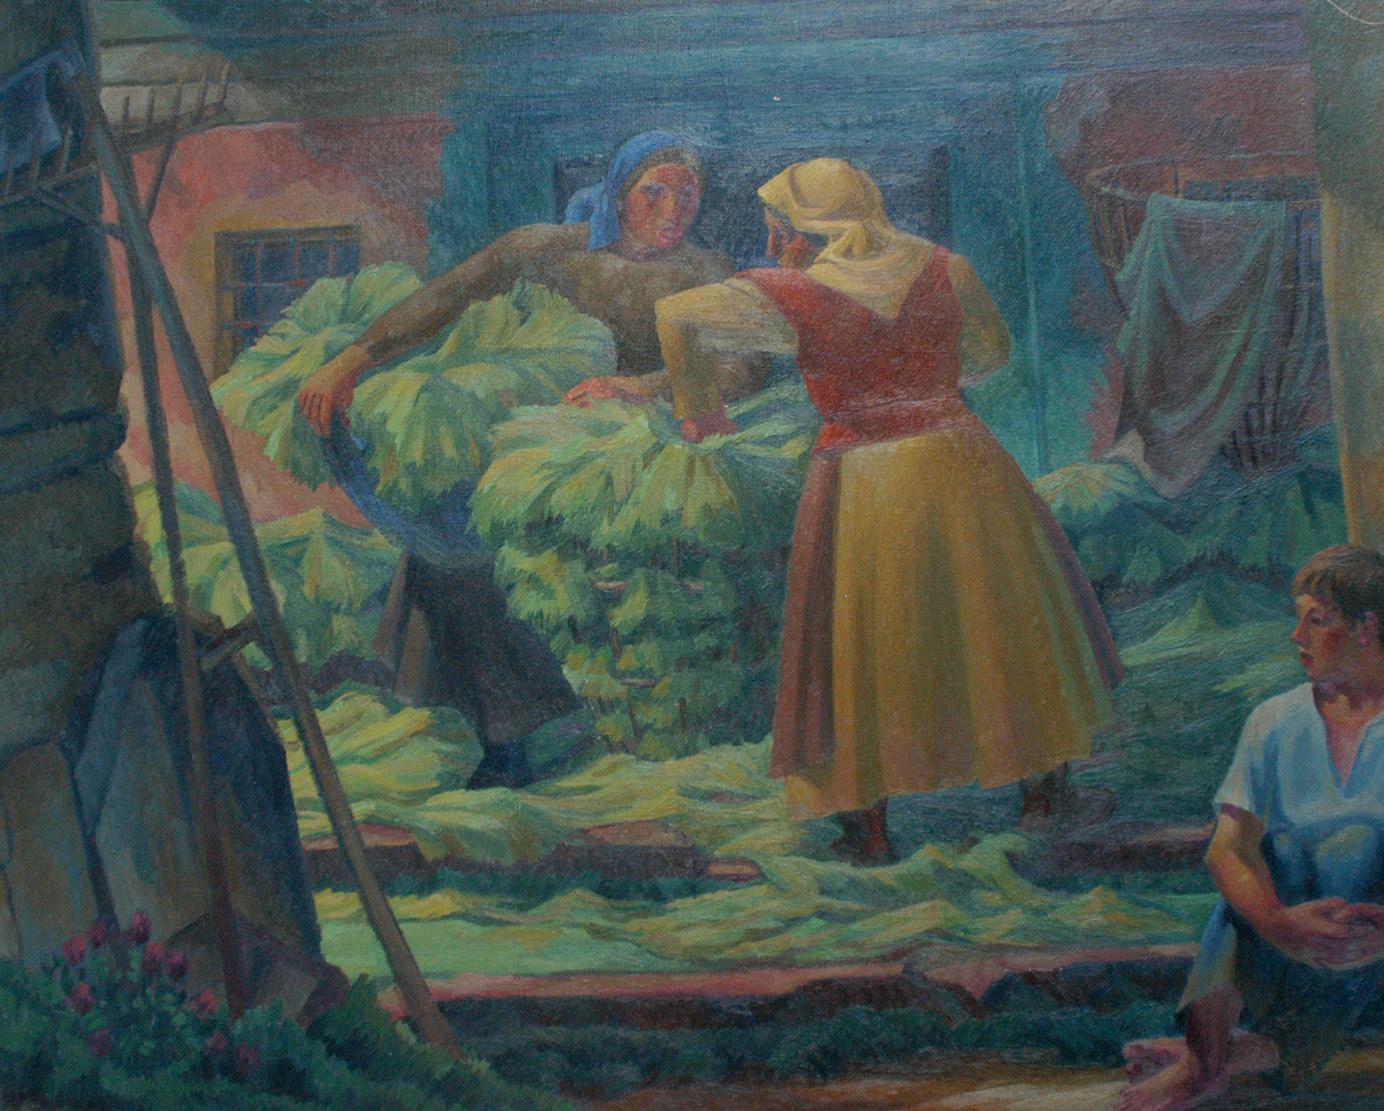 Femmes aux hottes. Peinture Robert Gallay